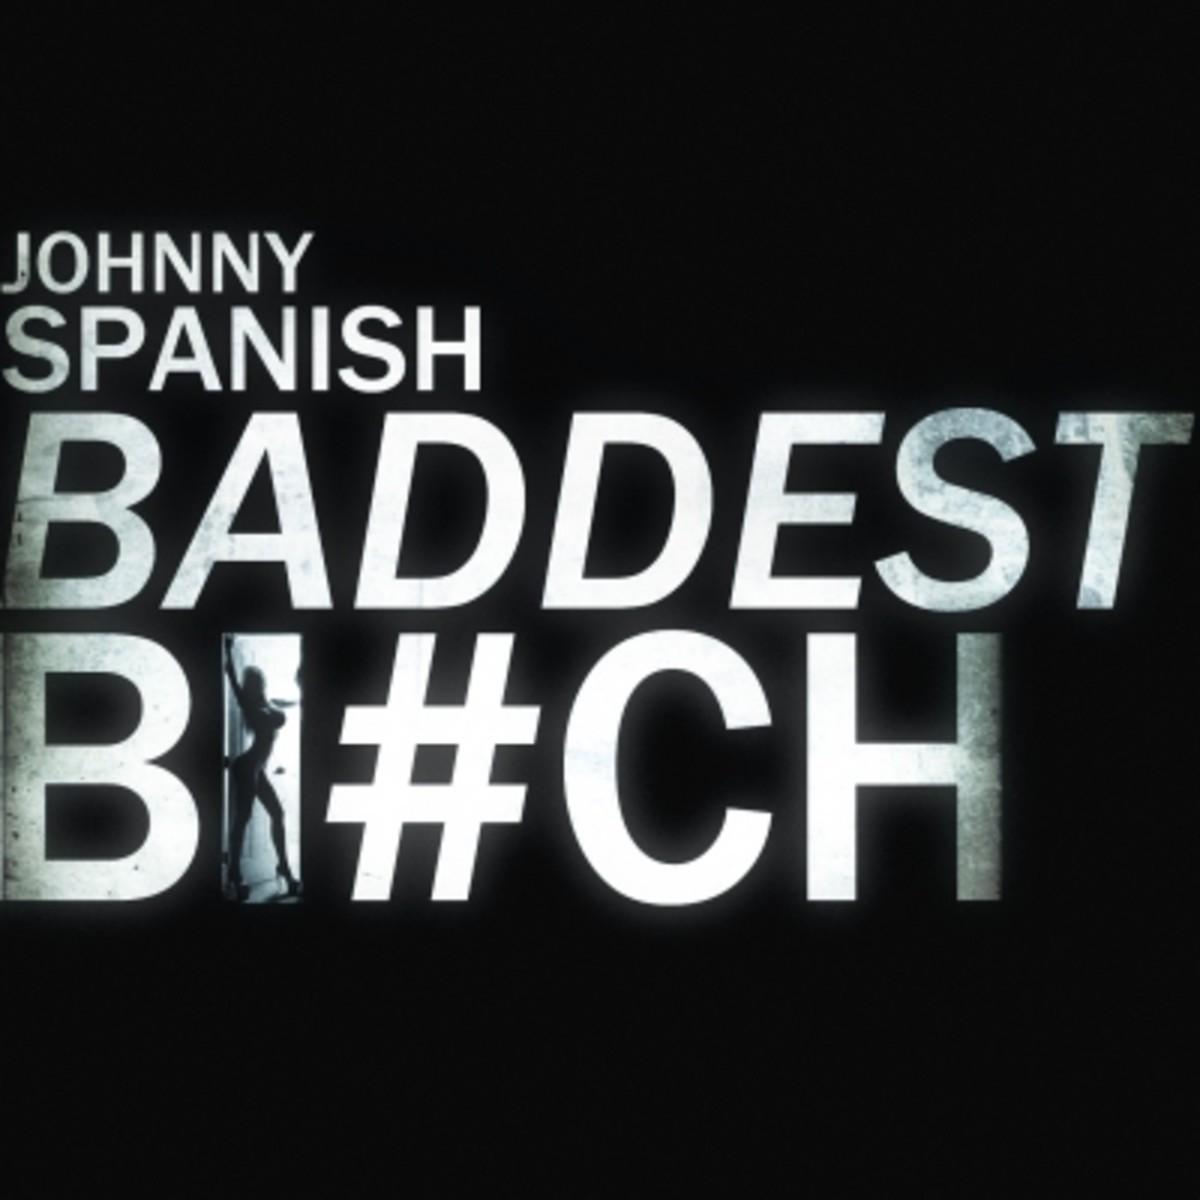 johnny-spanish-baddest-bitch.jpg